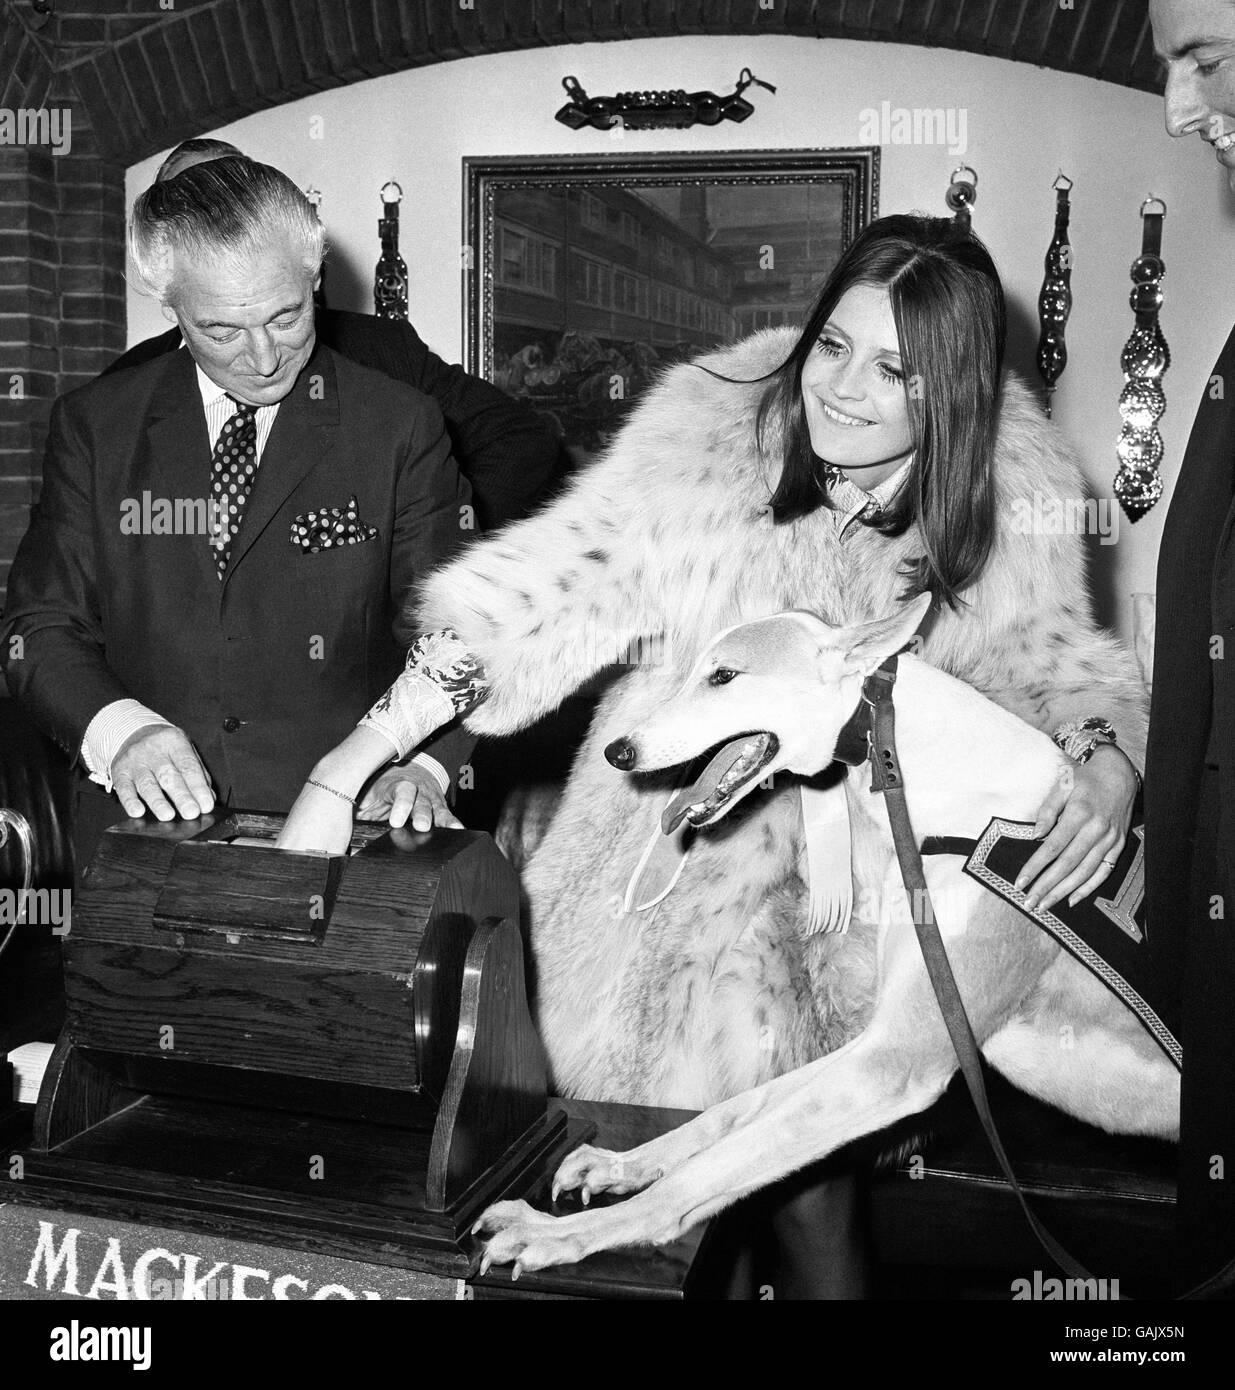 Greyhound Racing - Mackeson Greyhound Championship - Whitbread's City Cellars - Stock Image